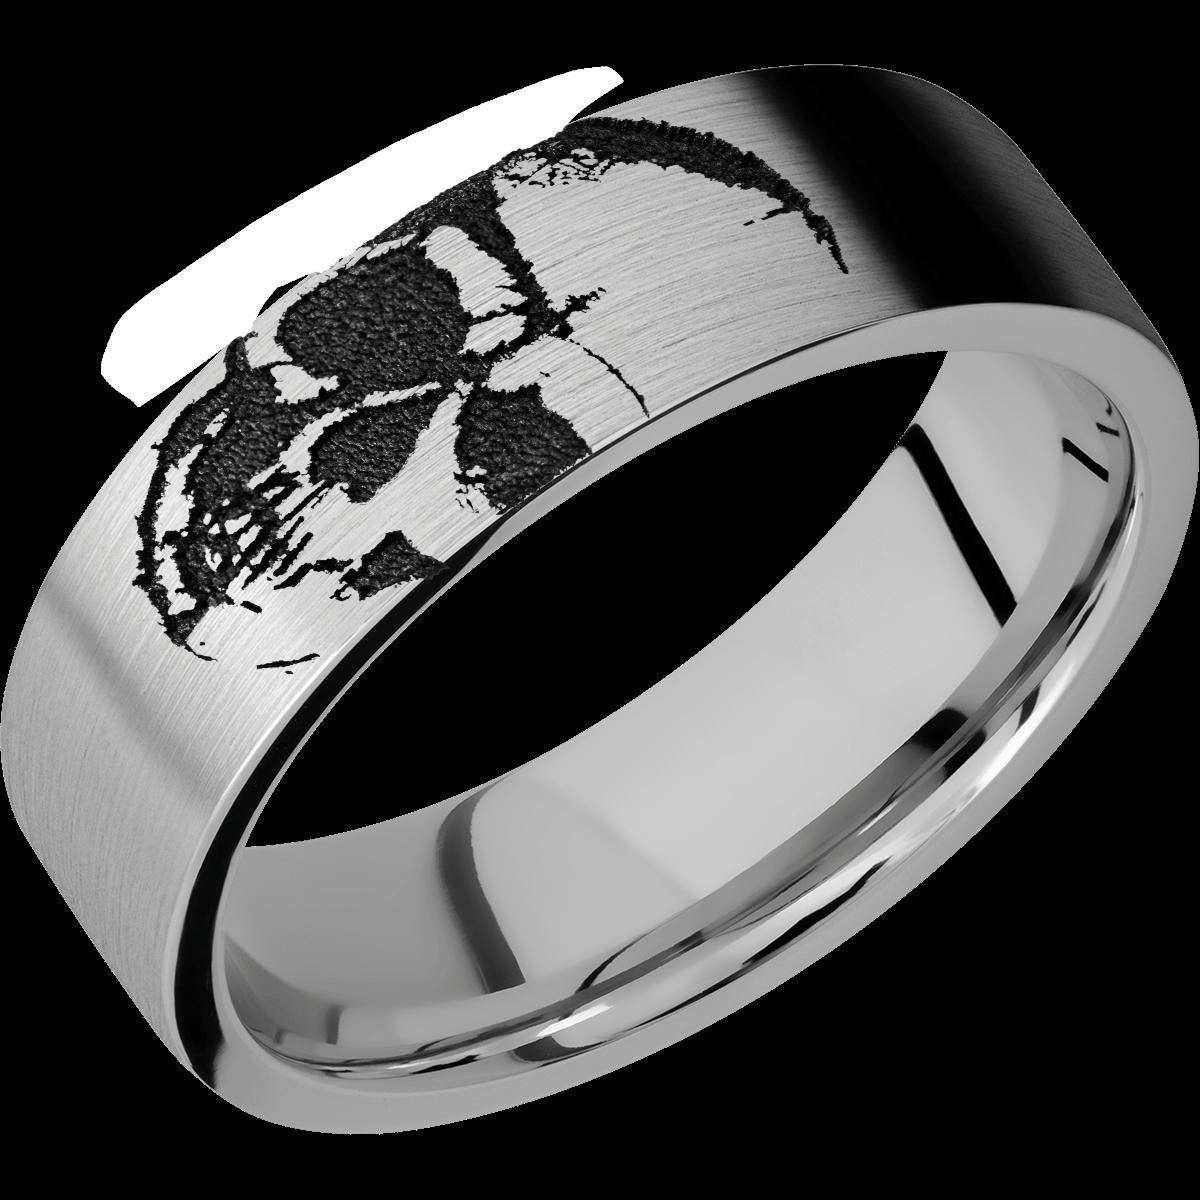 The Skully Skull Titanium Men's Wedding Band in 2020